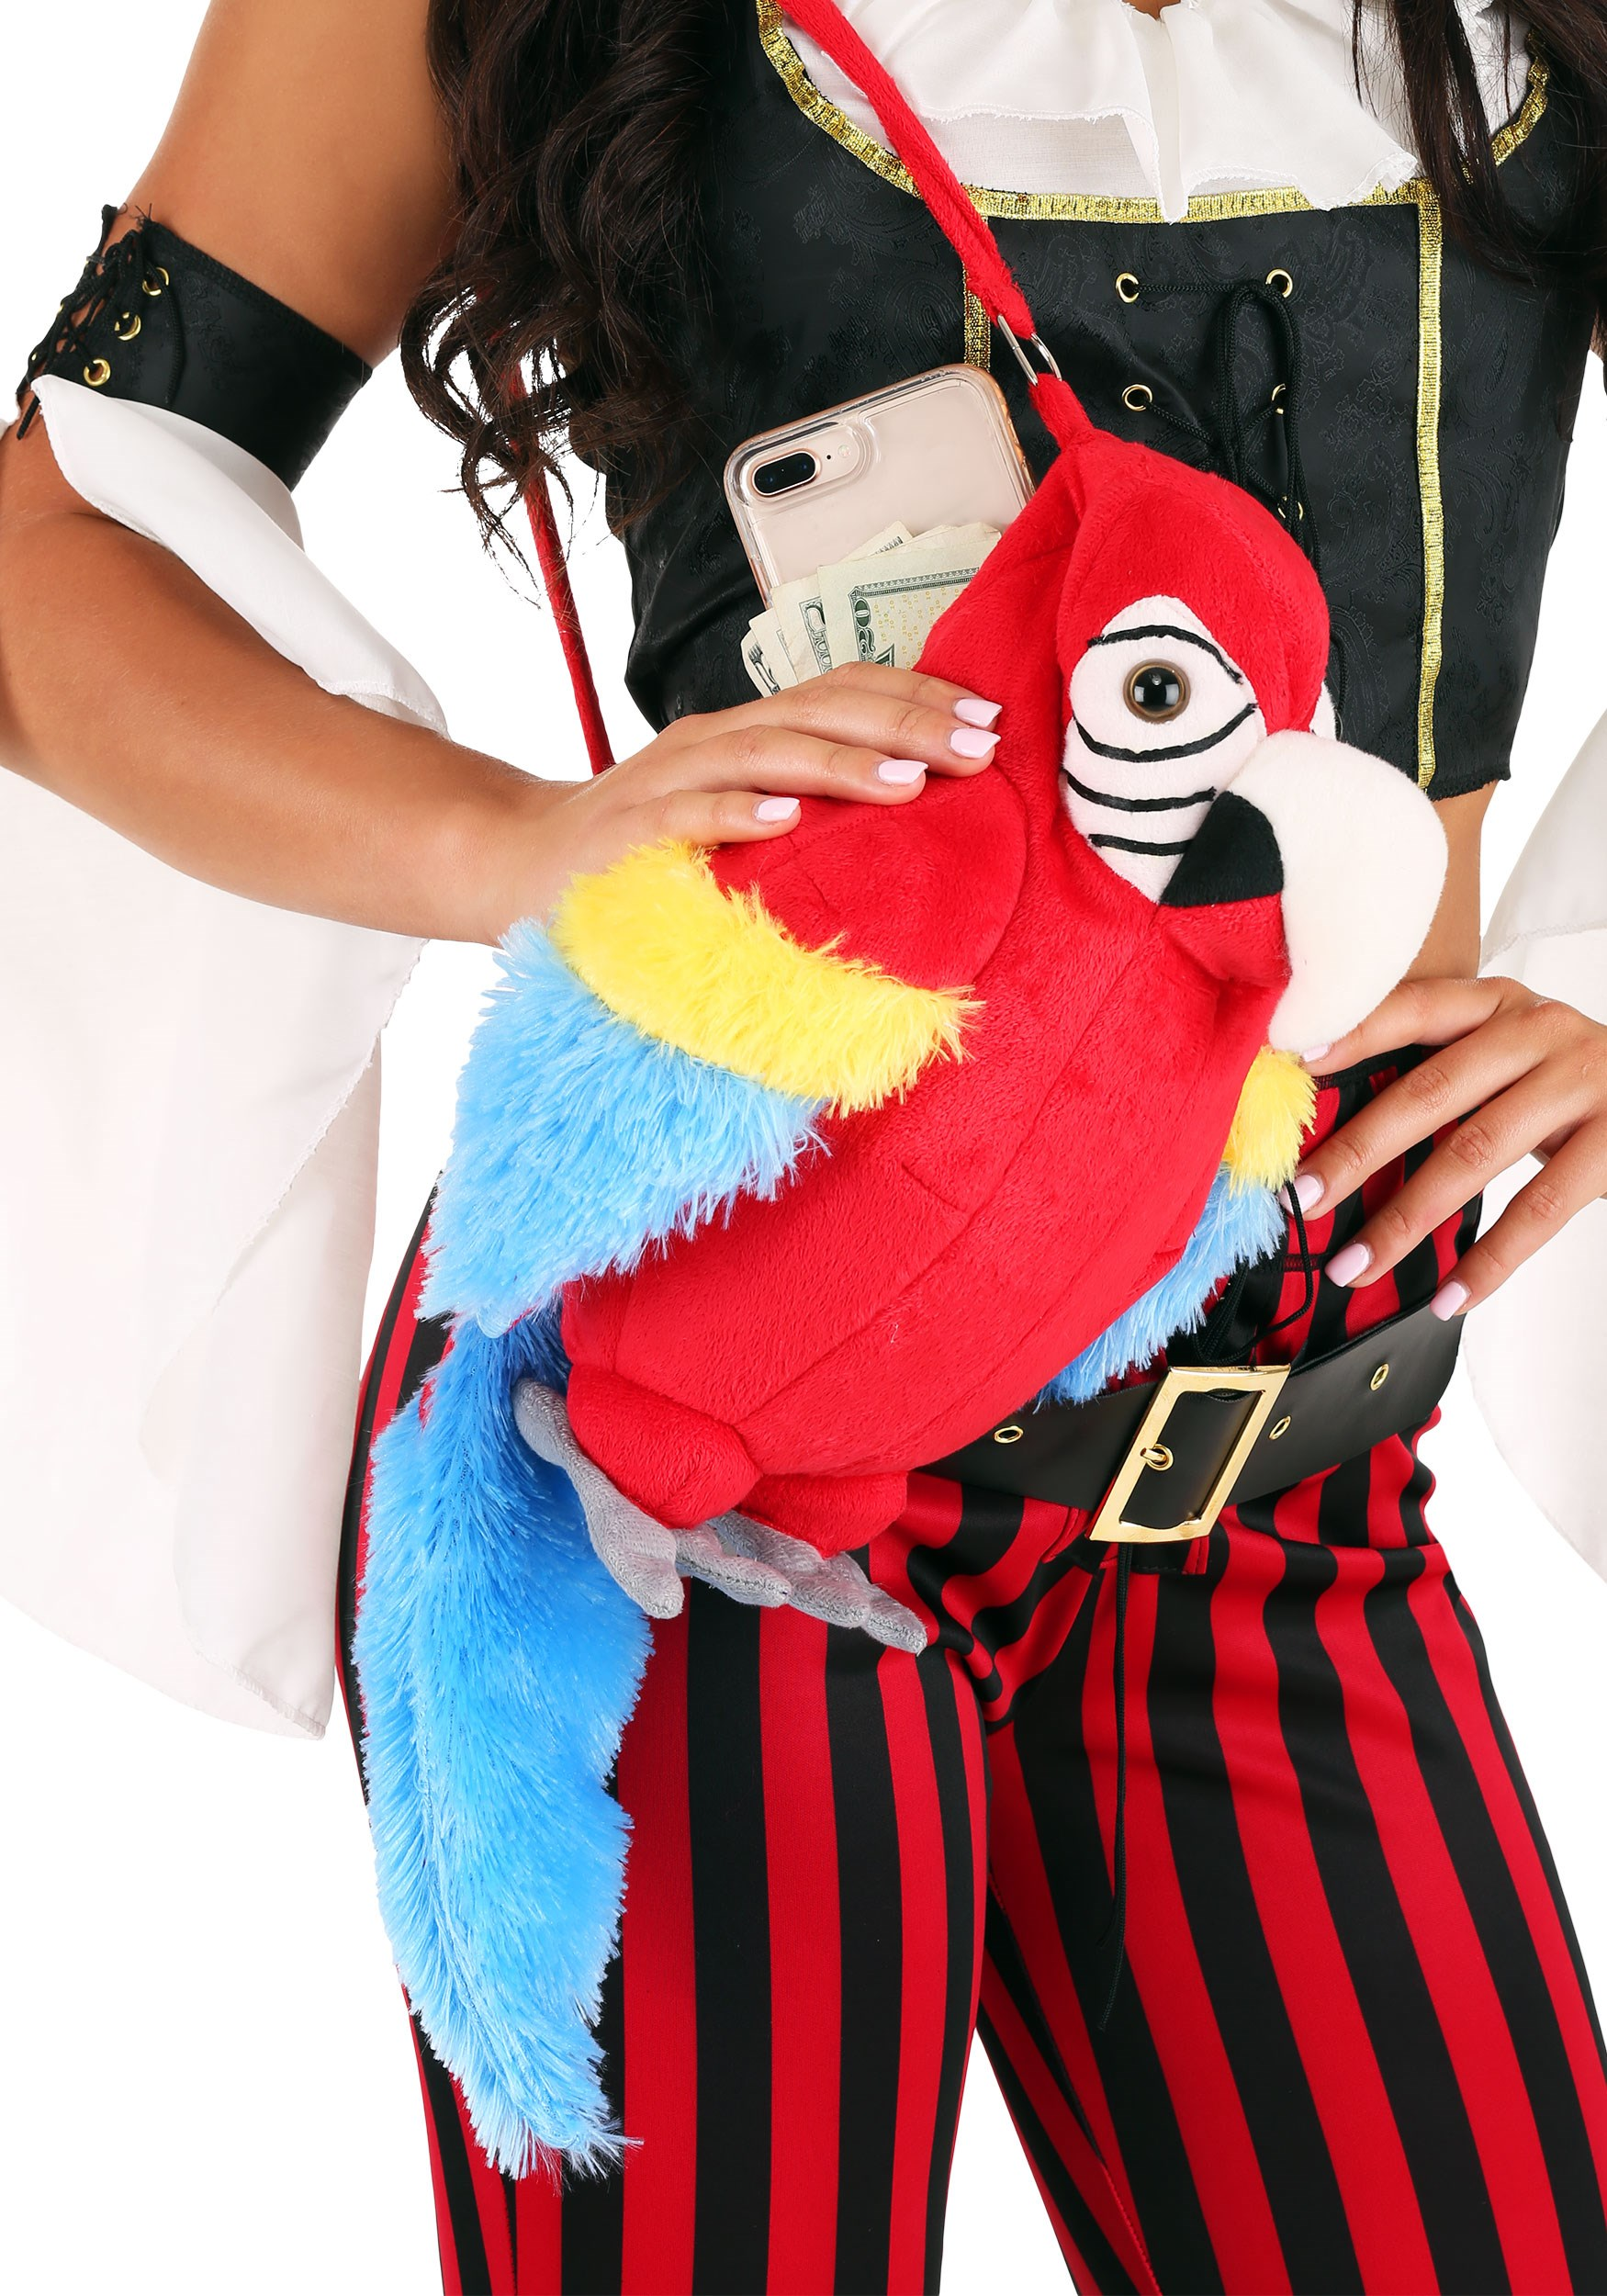 Toddler Squawking Parrot Costume